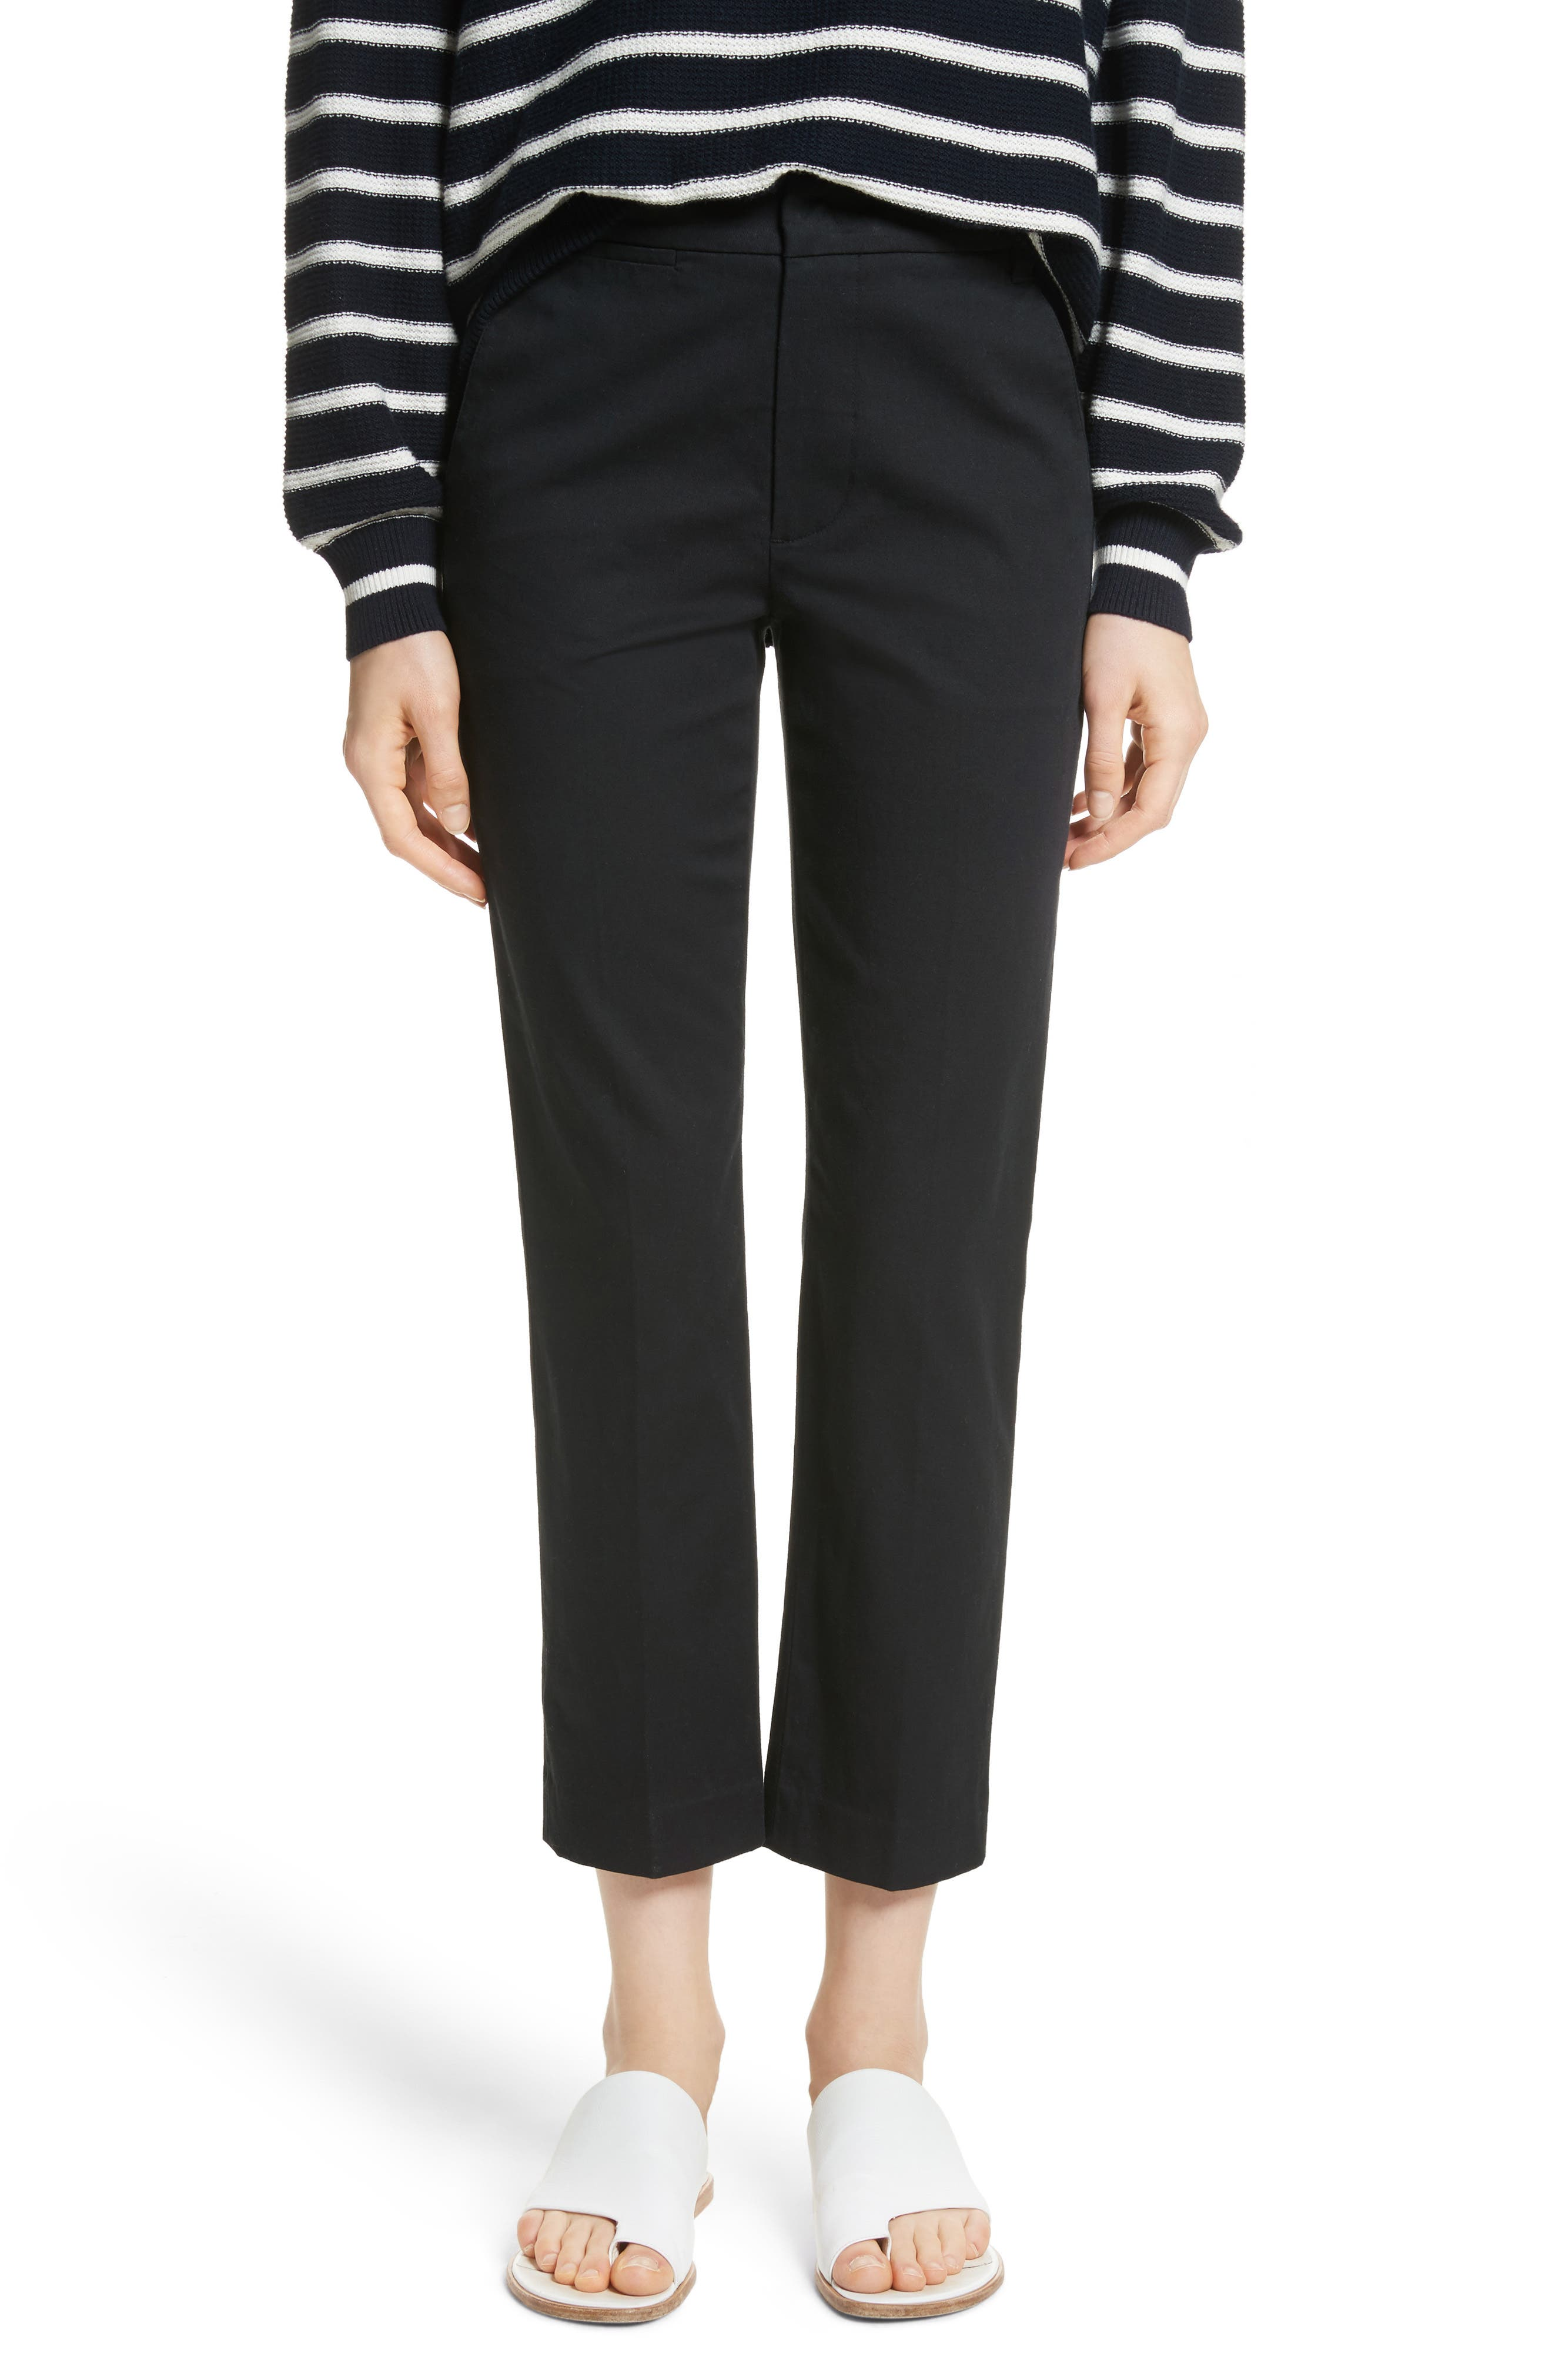 VINCE Coin Pocket Chino Pants, Main, color, BLACK